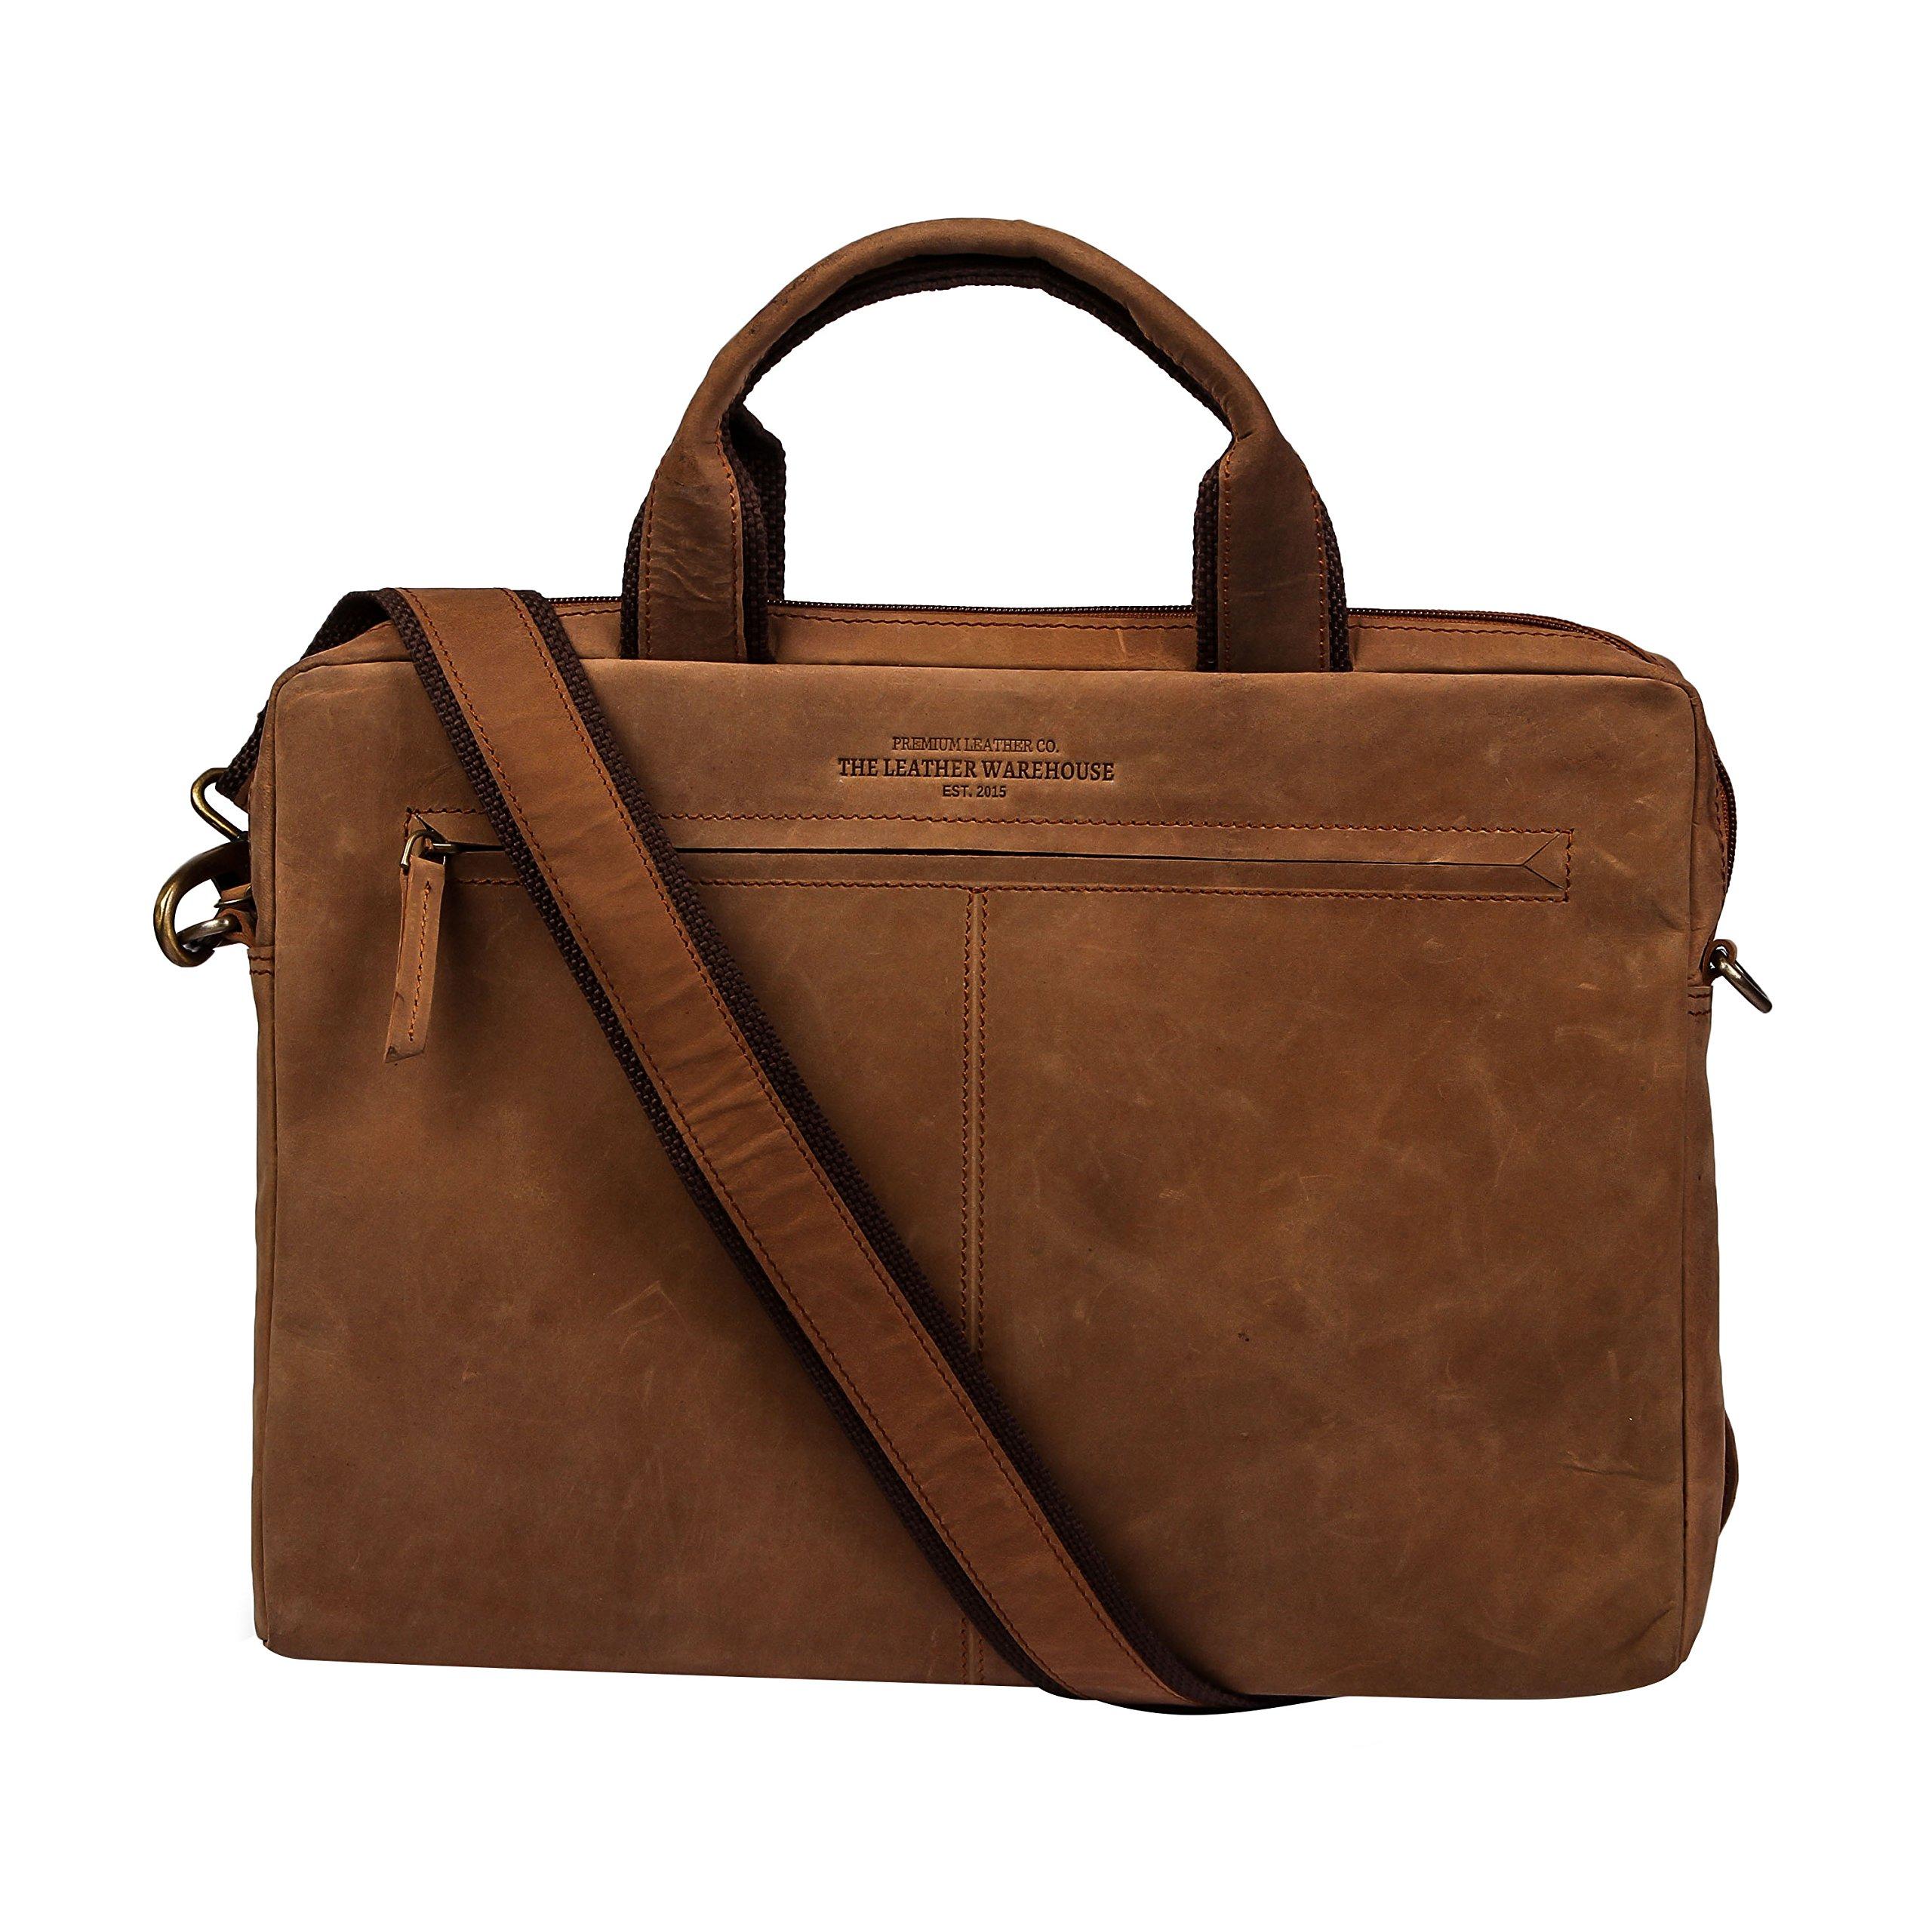 13 - 13.3 inch vintage Leather Sleek Handmade Sleeve   Shoulder bag   Messenger Bag   Office Briefcase compatible with MacBook Ultrabook Chromebook Notebook - Dark Brown by The Leather Warehouse